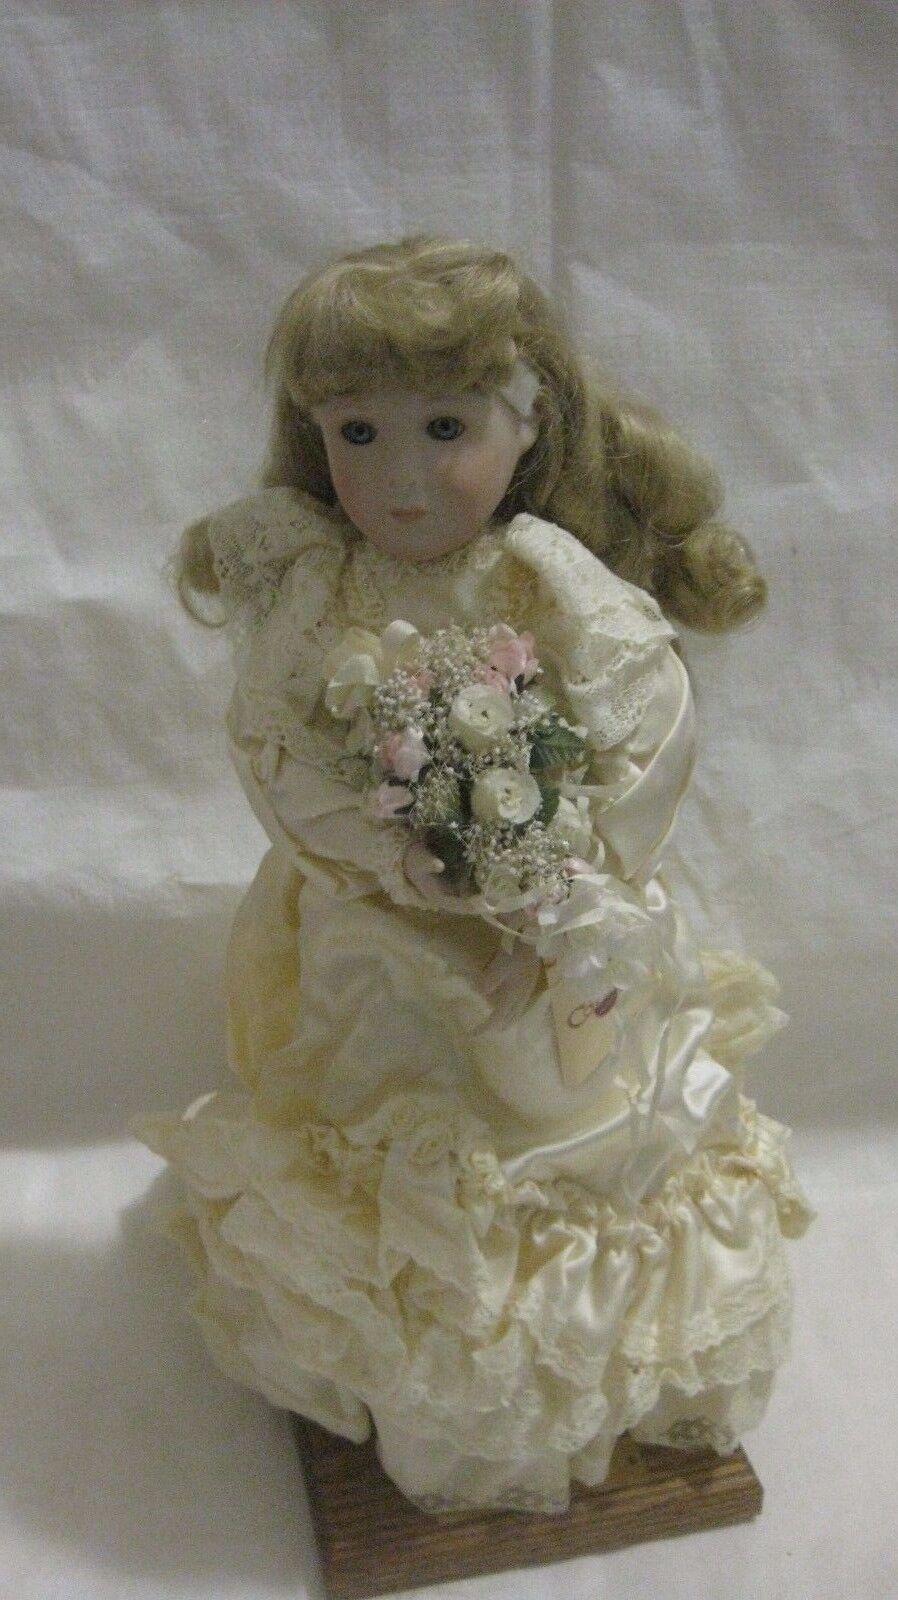 Seltener Porzellan-Puppe Jennifer Viktorianisch Bride  432 Of 1,000 From The